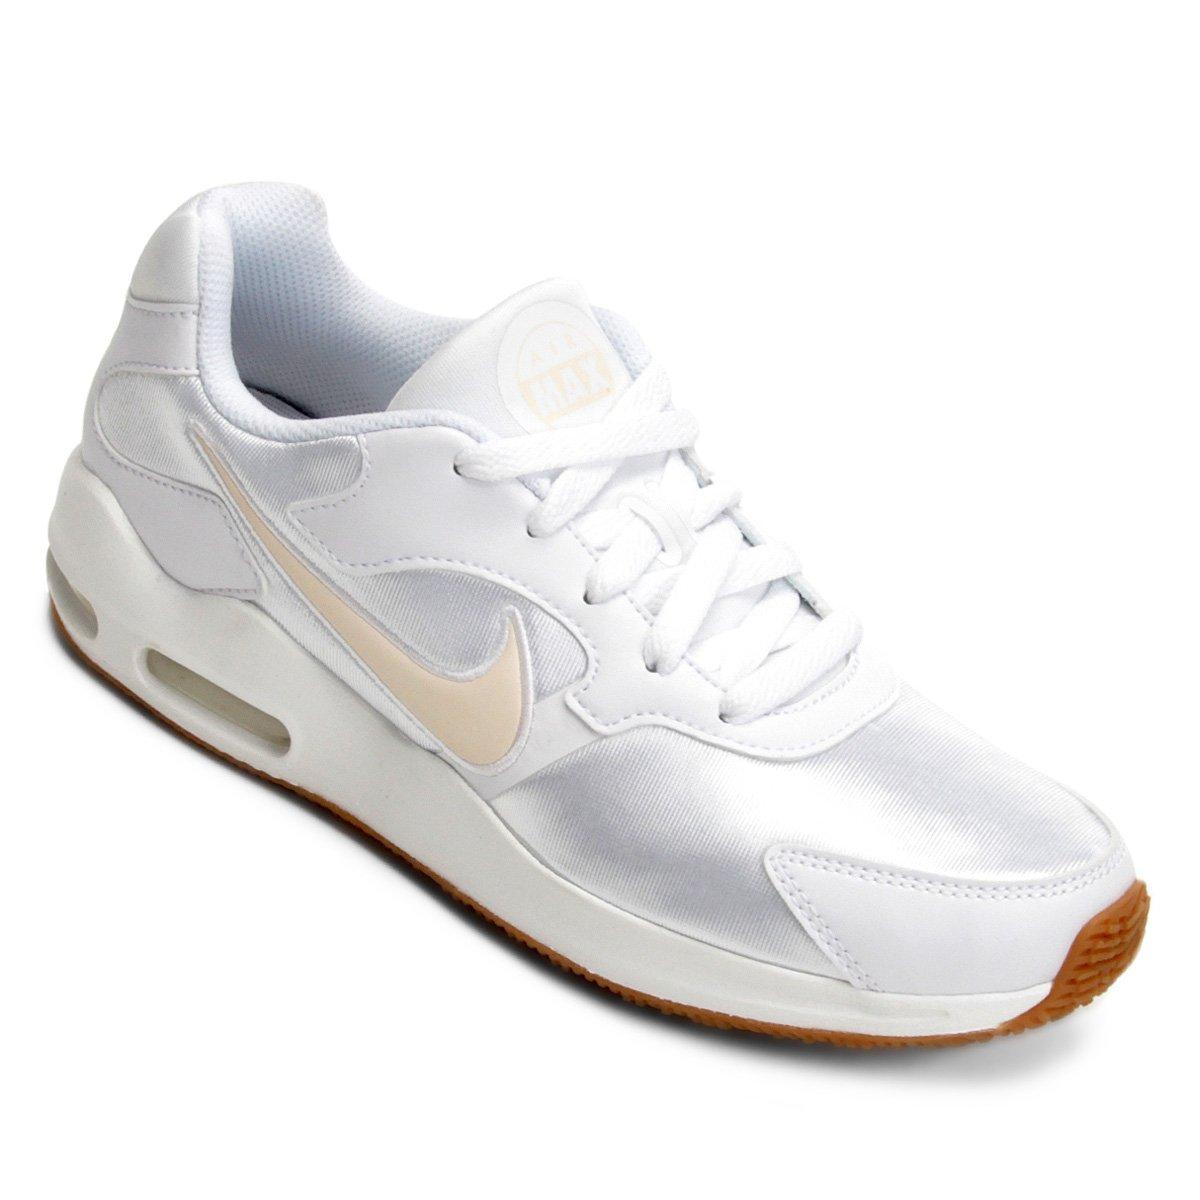 Tênis Nike Wmns Air Max Guile Feminino Branco E Marrom